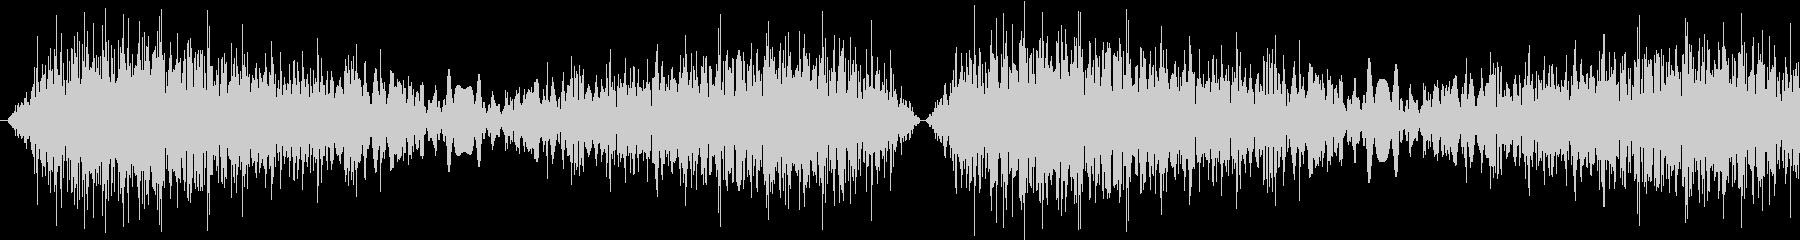 DJプレイ スクラッチ・ノイズ 2の未再生の波形